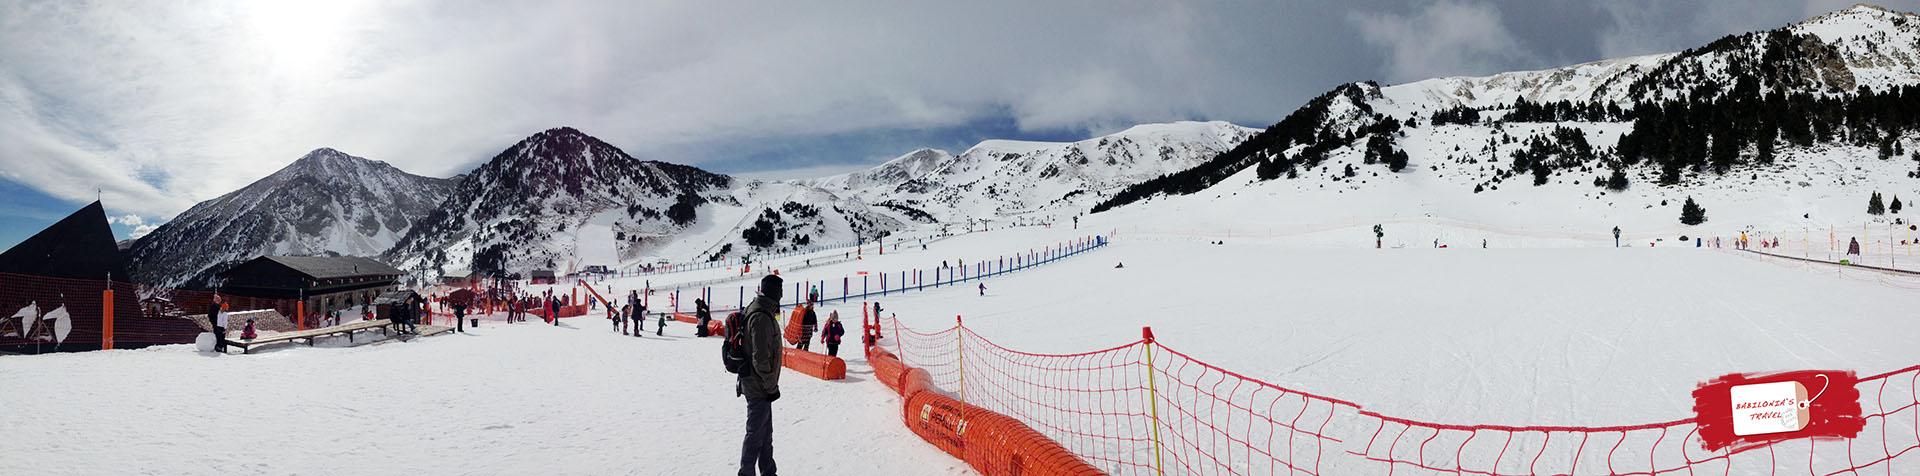 nieve vallter